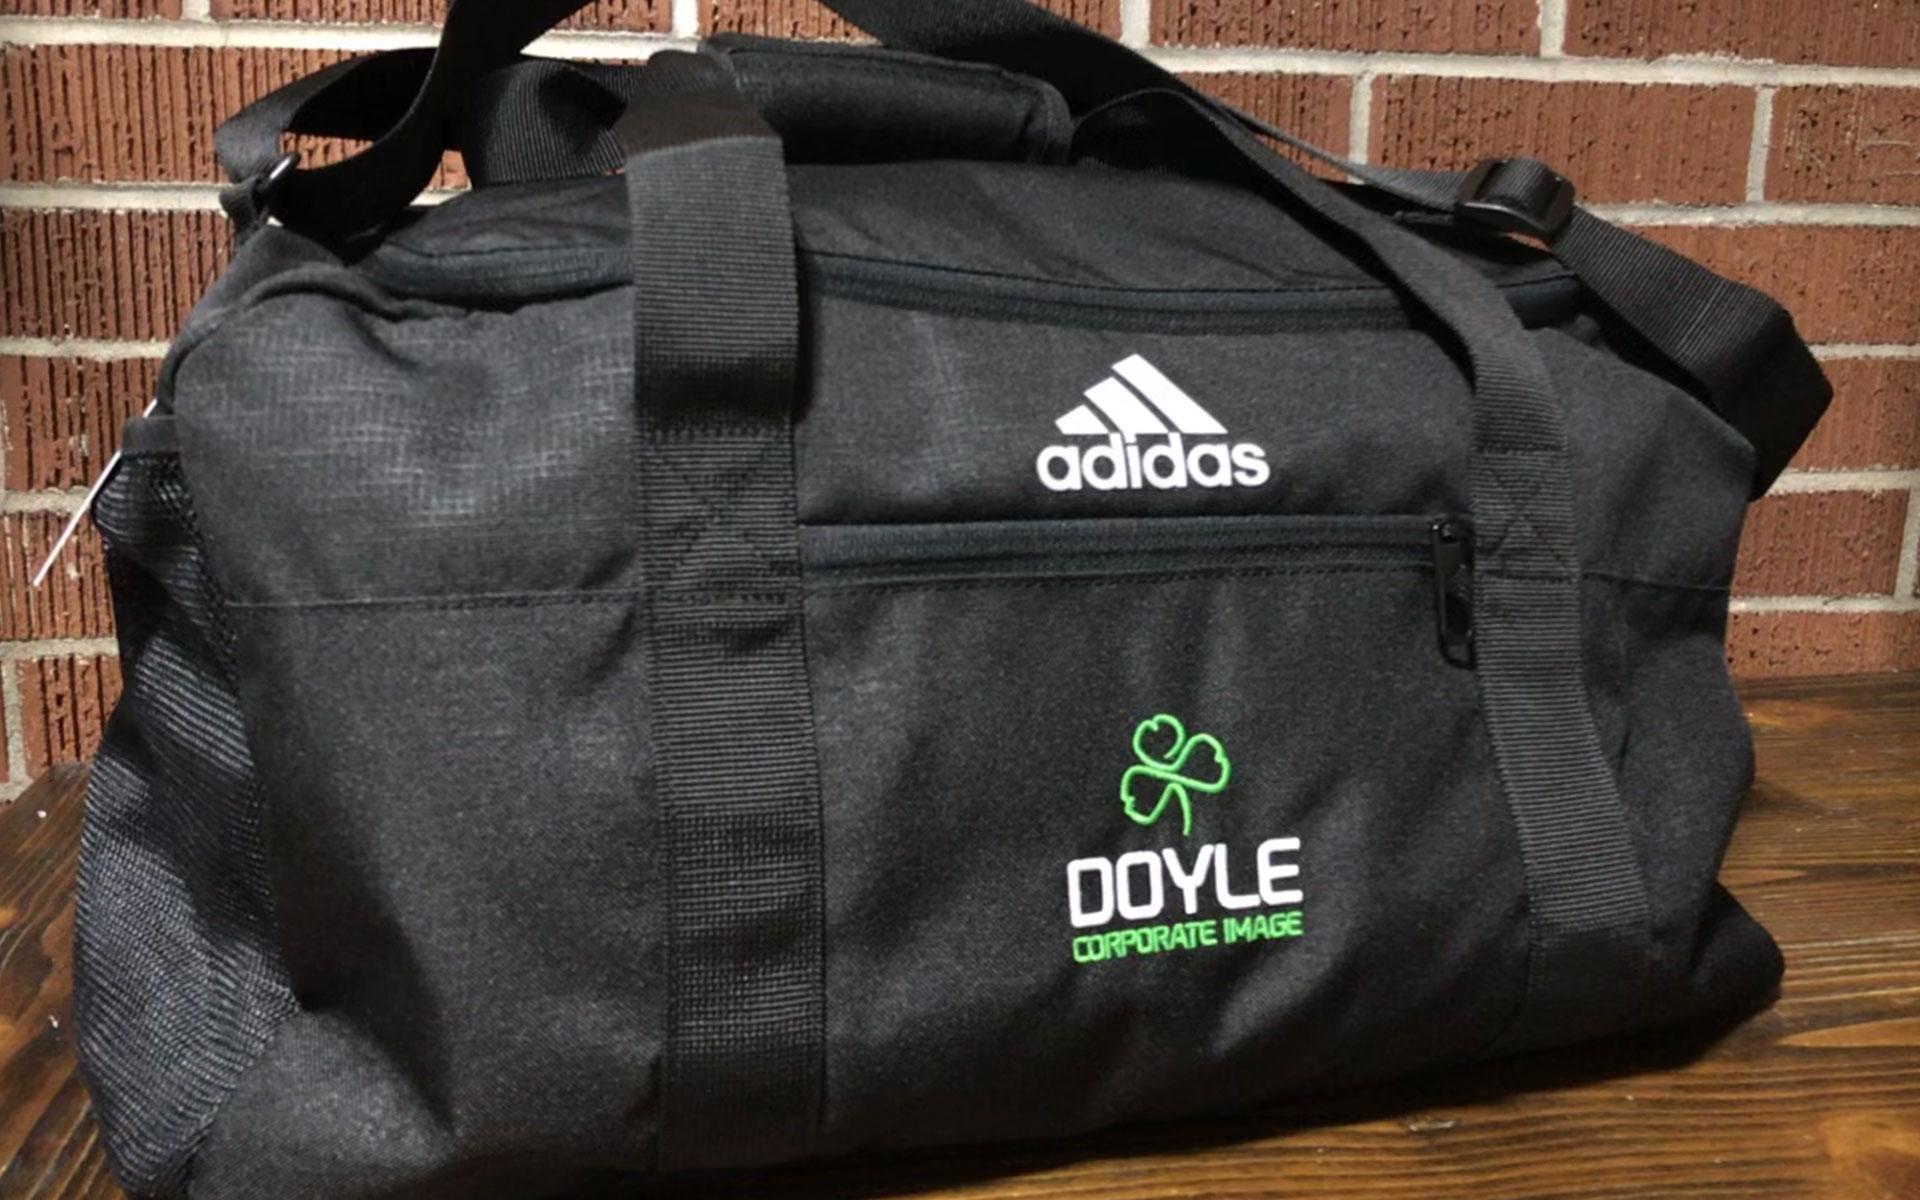 doyle_corporate_image_team_bags